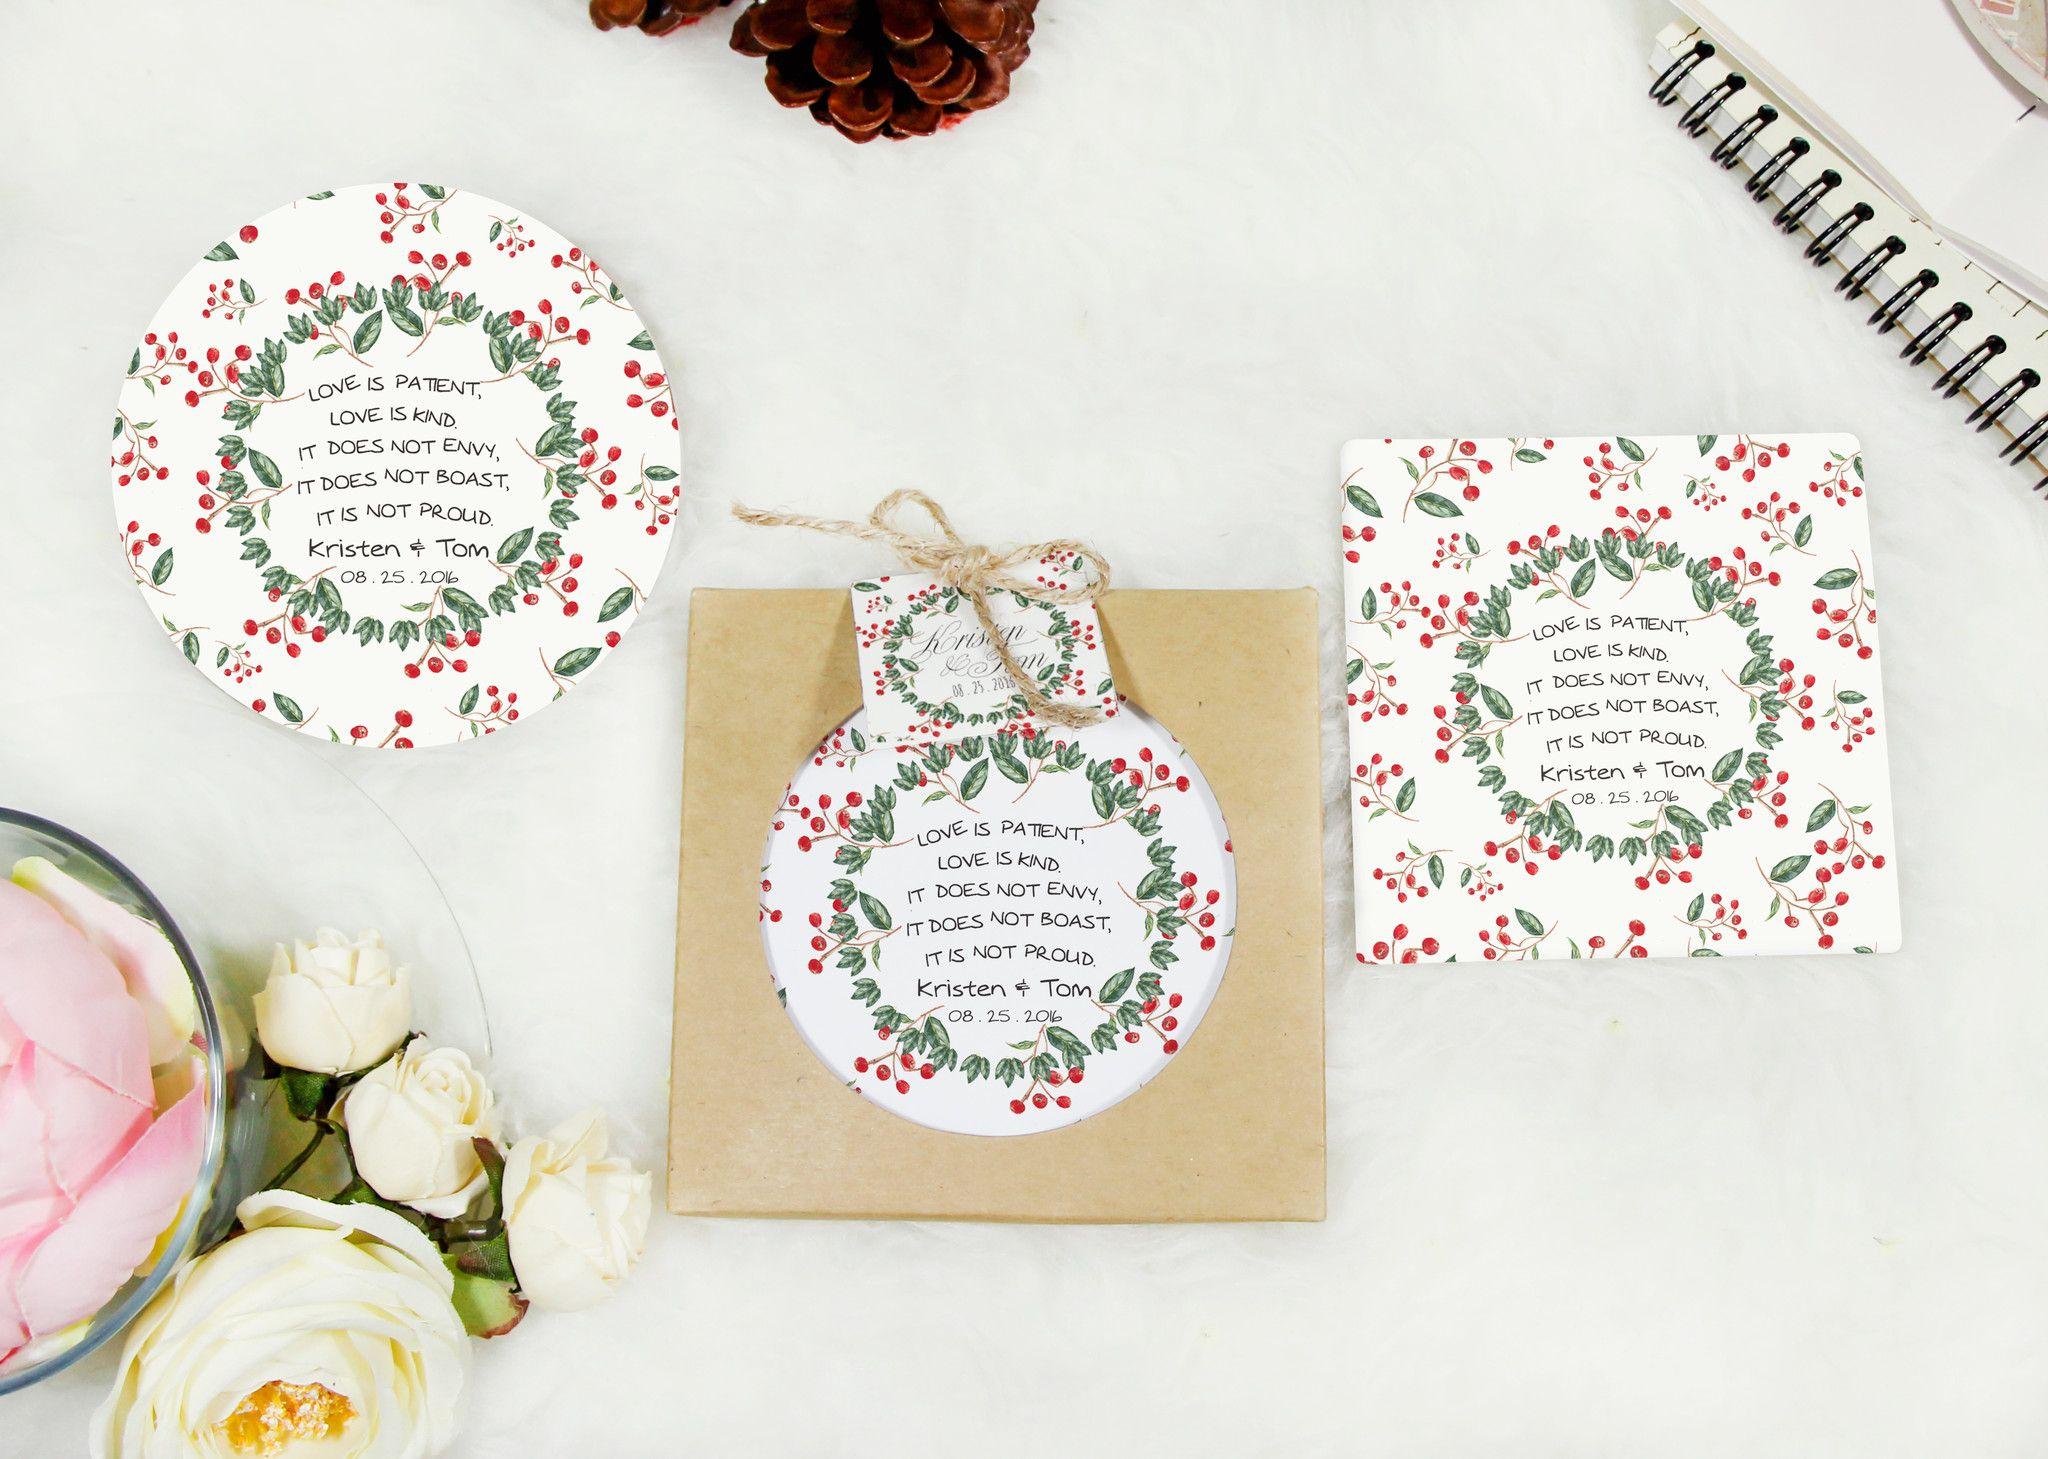 Love is patient coasters wedding favor wedding gift guest gift